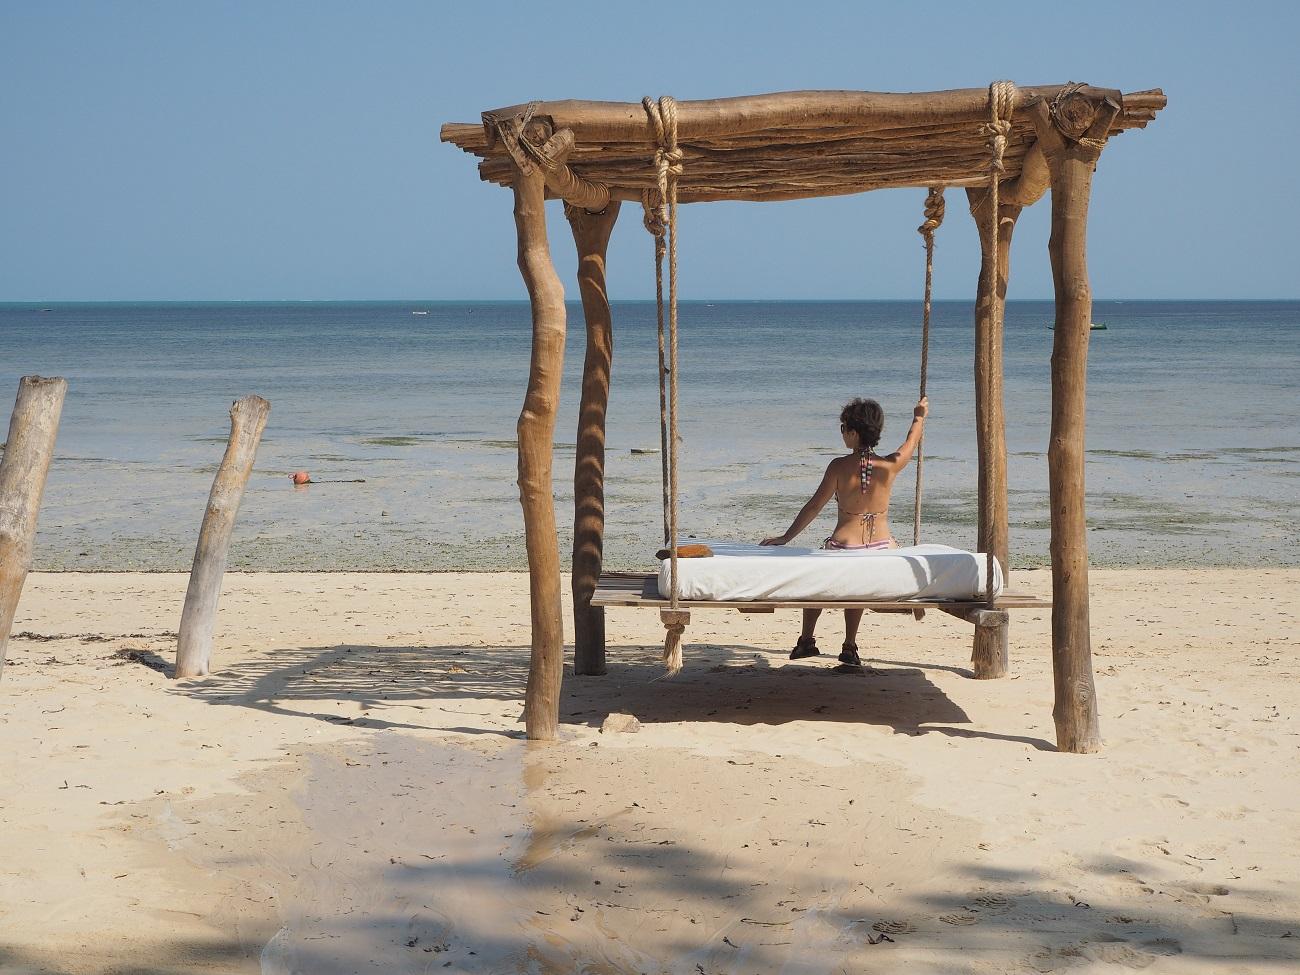 5. kép: Madagaszkár